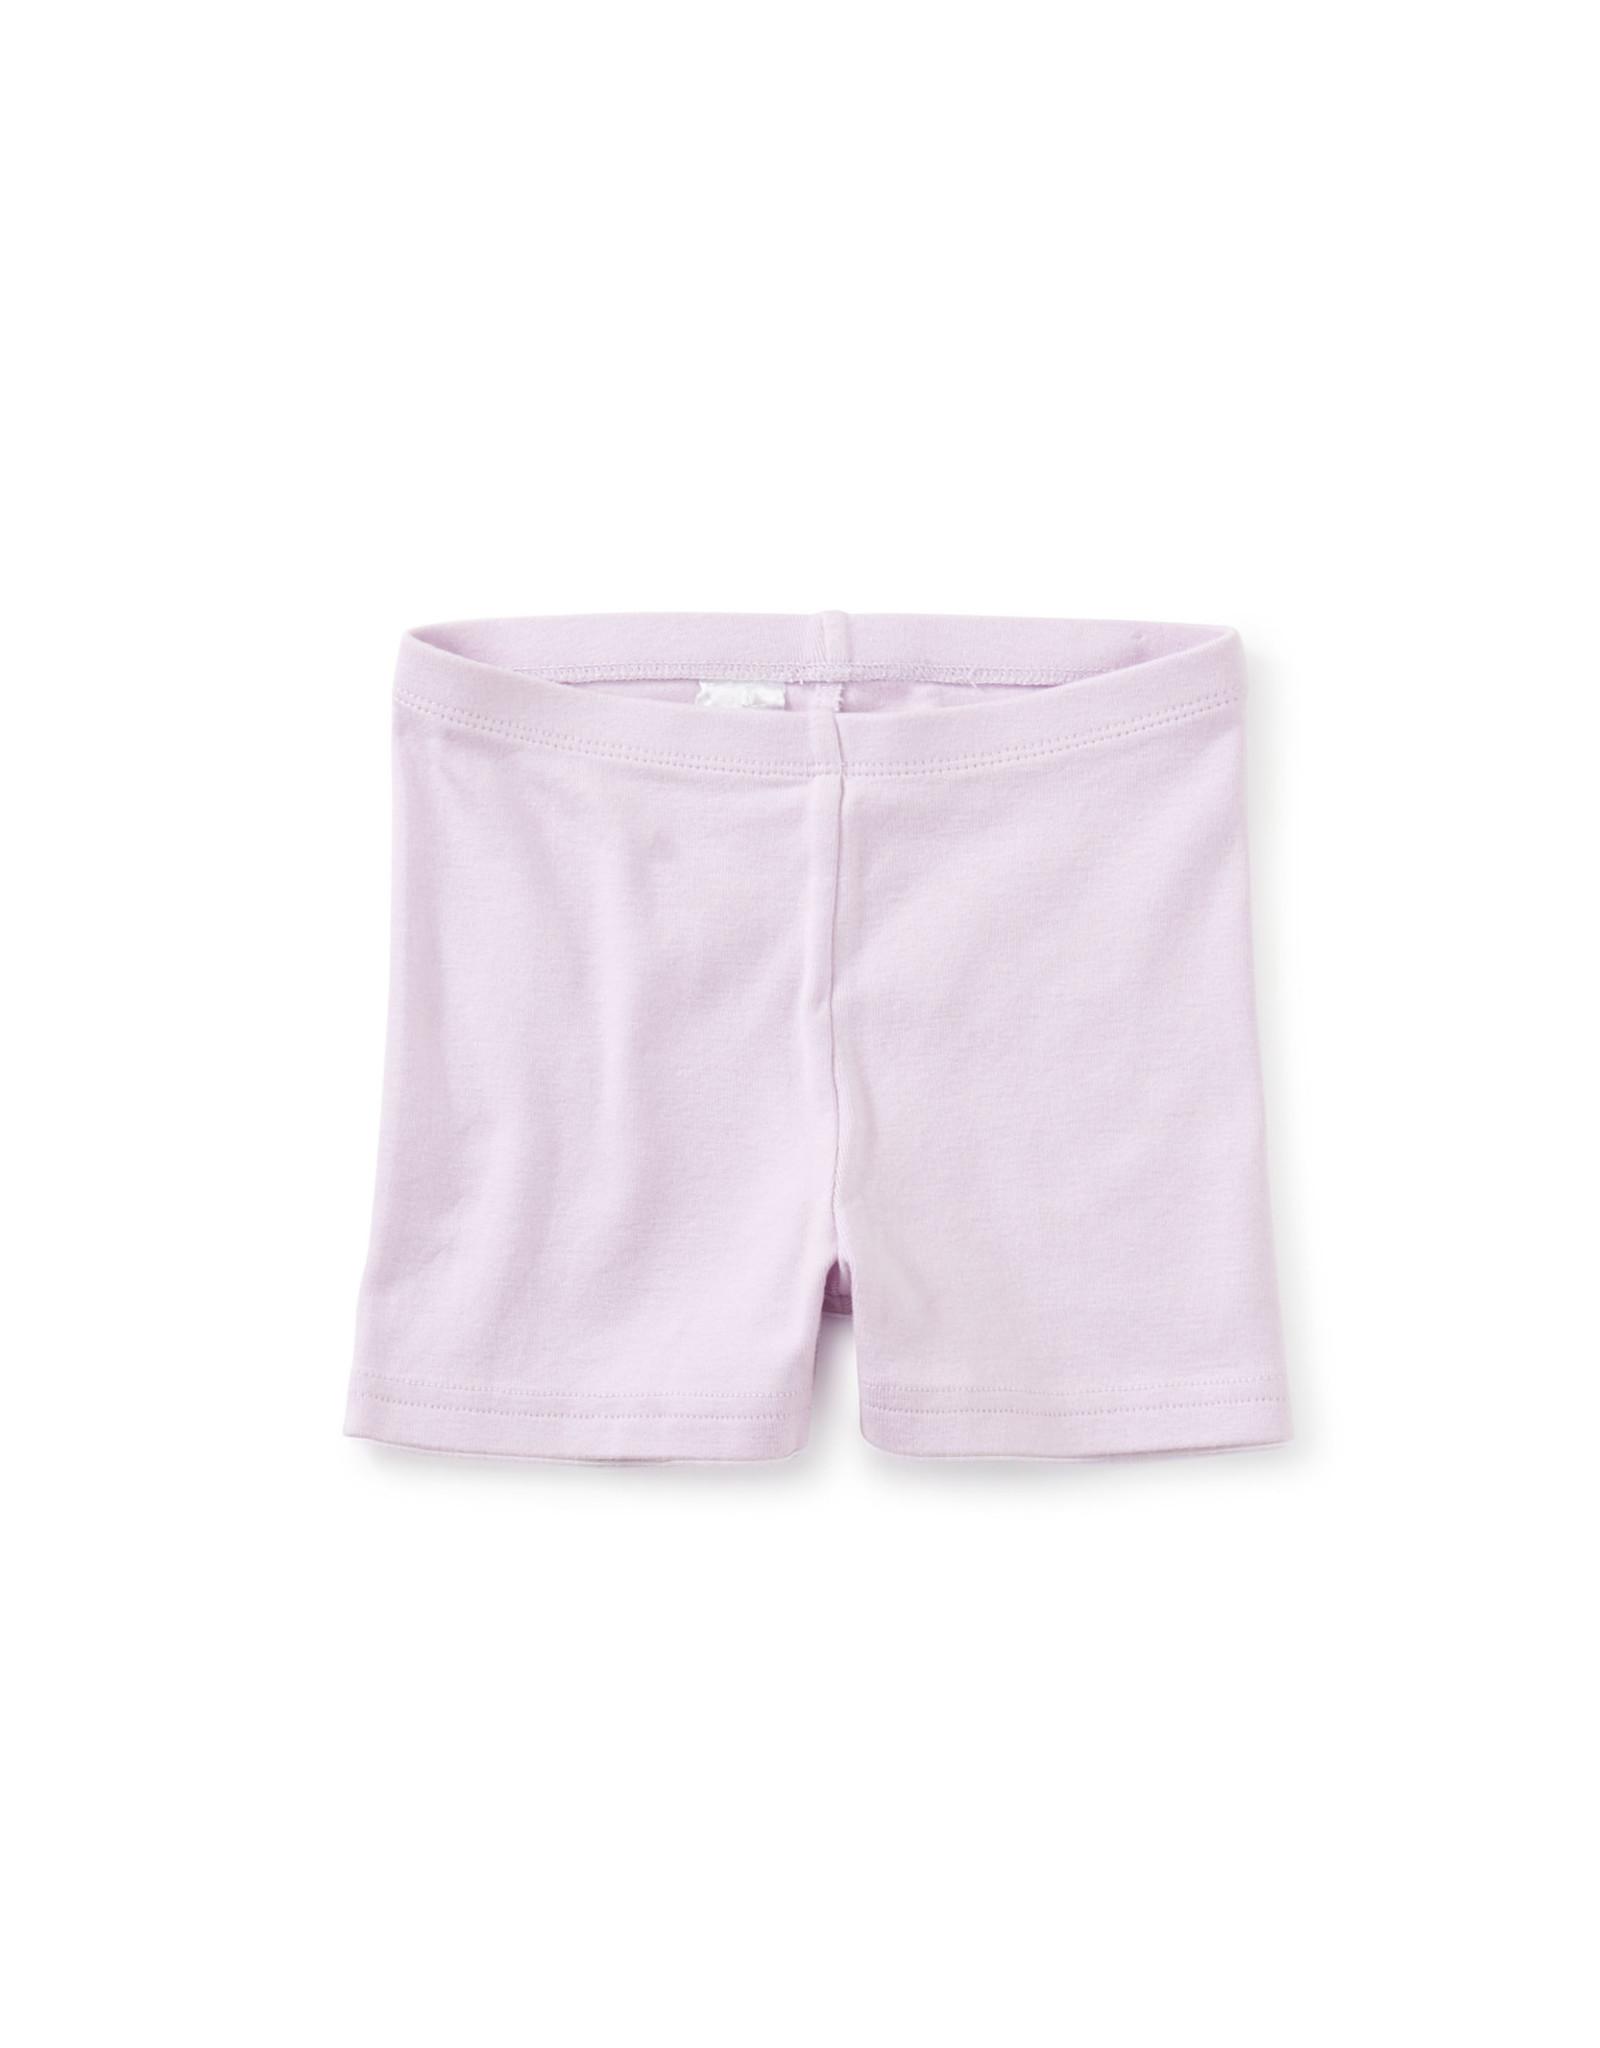 Tea Somersault Shorts, Orion